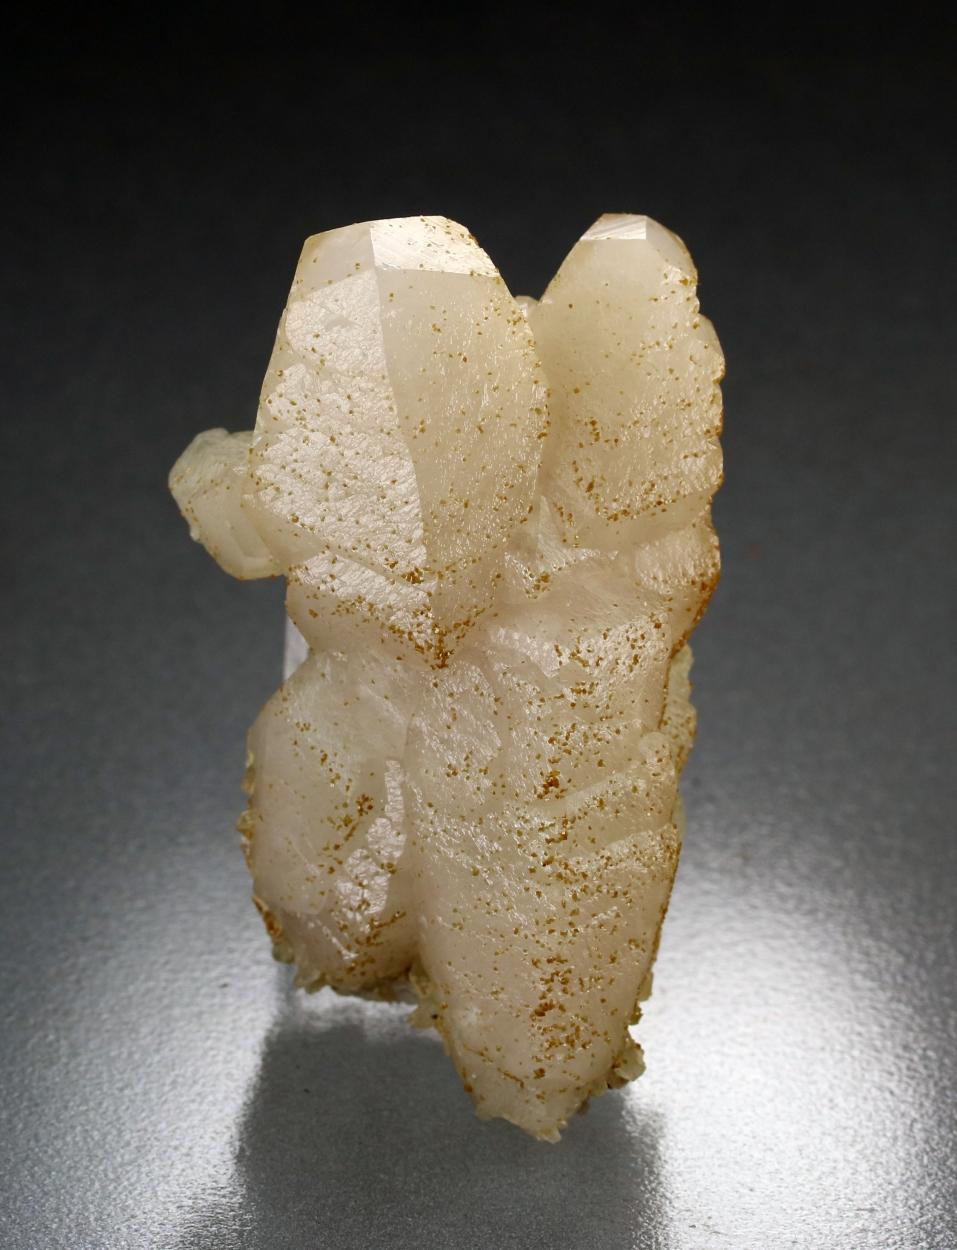 Manganoan Calcite With Rhodochrosite